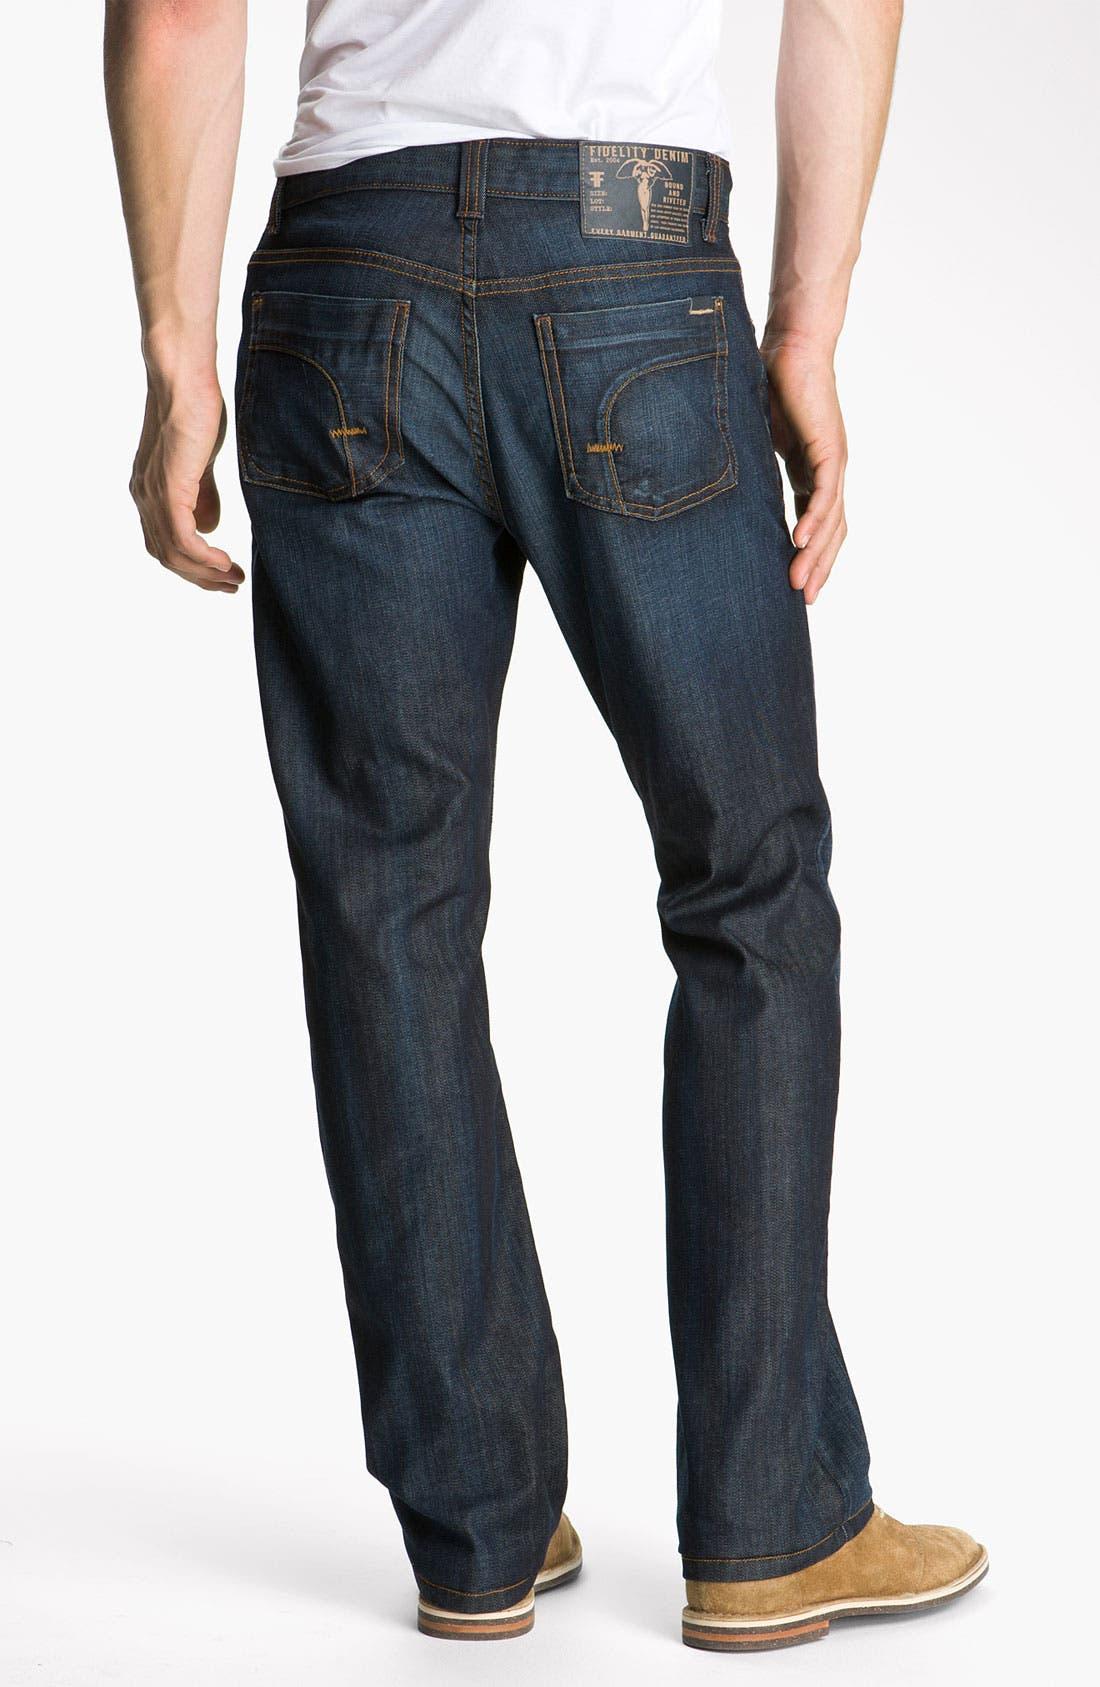 Alternate Image 2  - Fidelity Denim 'Impala' Slim Straight Leg Jeans (Altmont Dark Vintage)